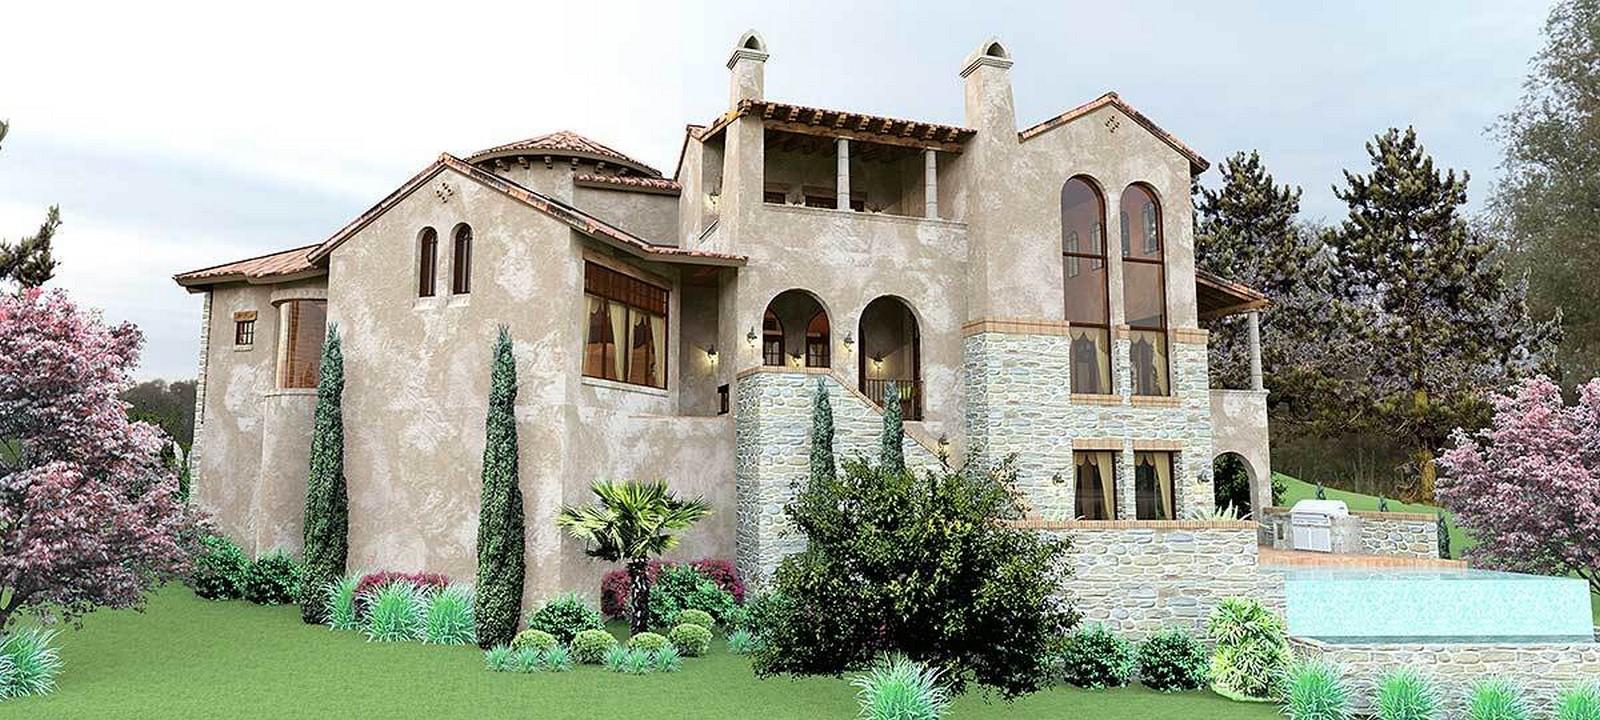 30 Examples of Tuscan residences - Sheet9